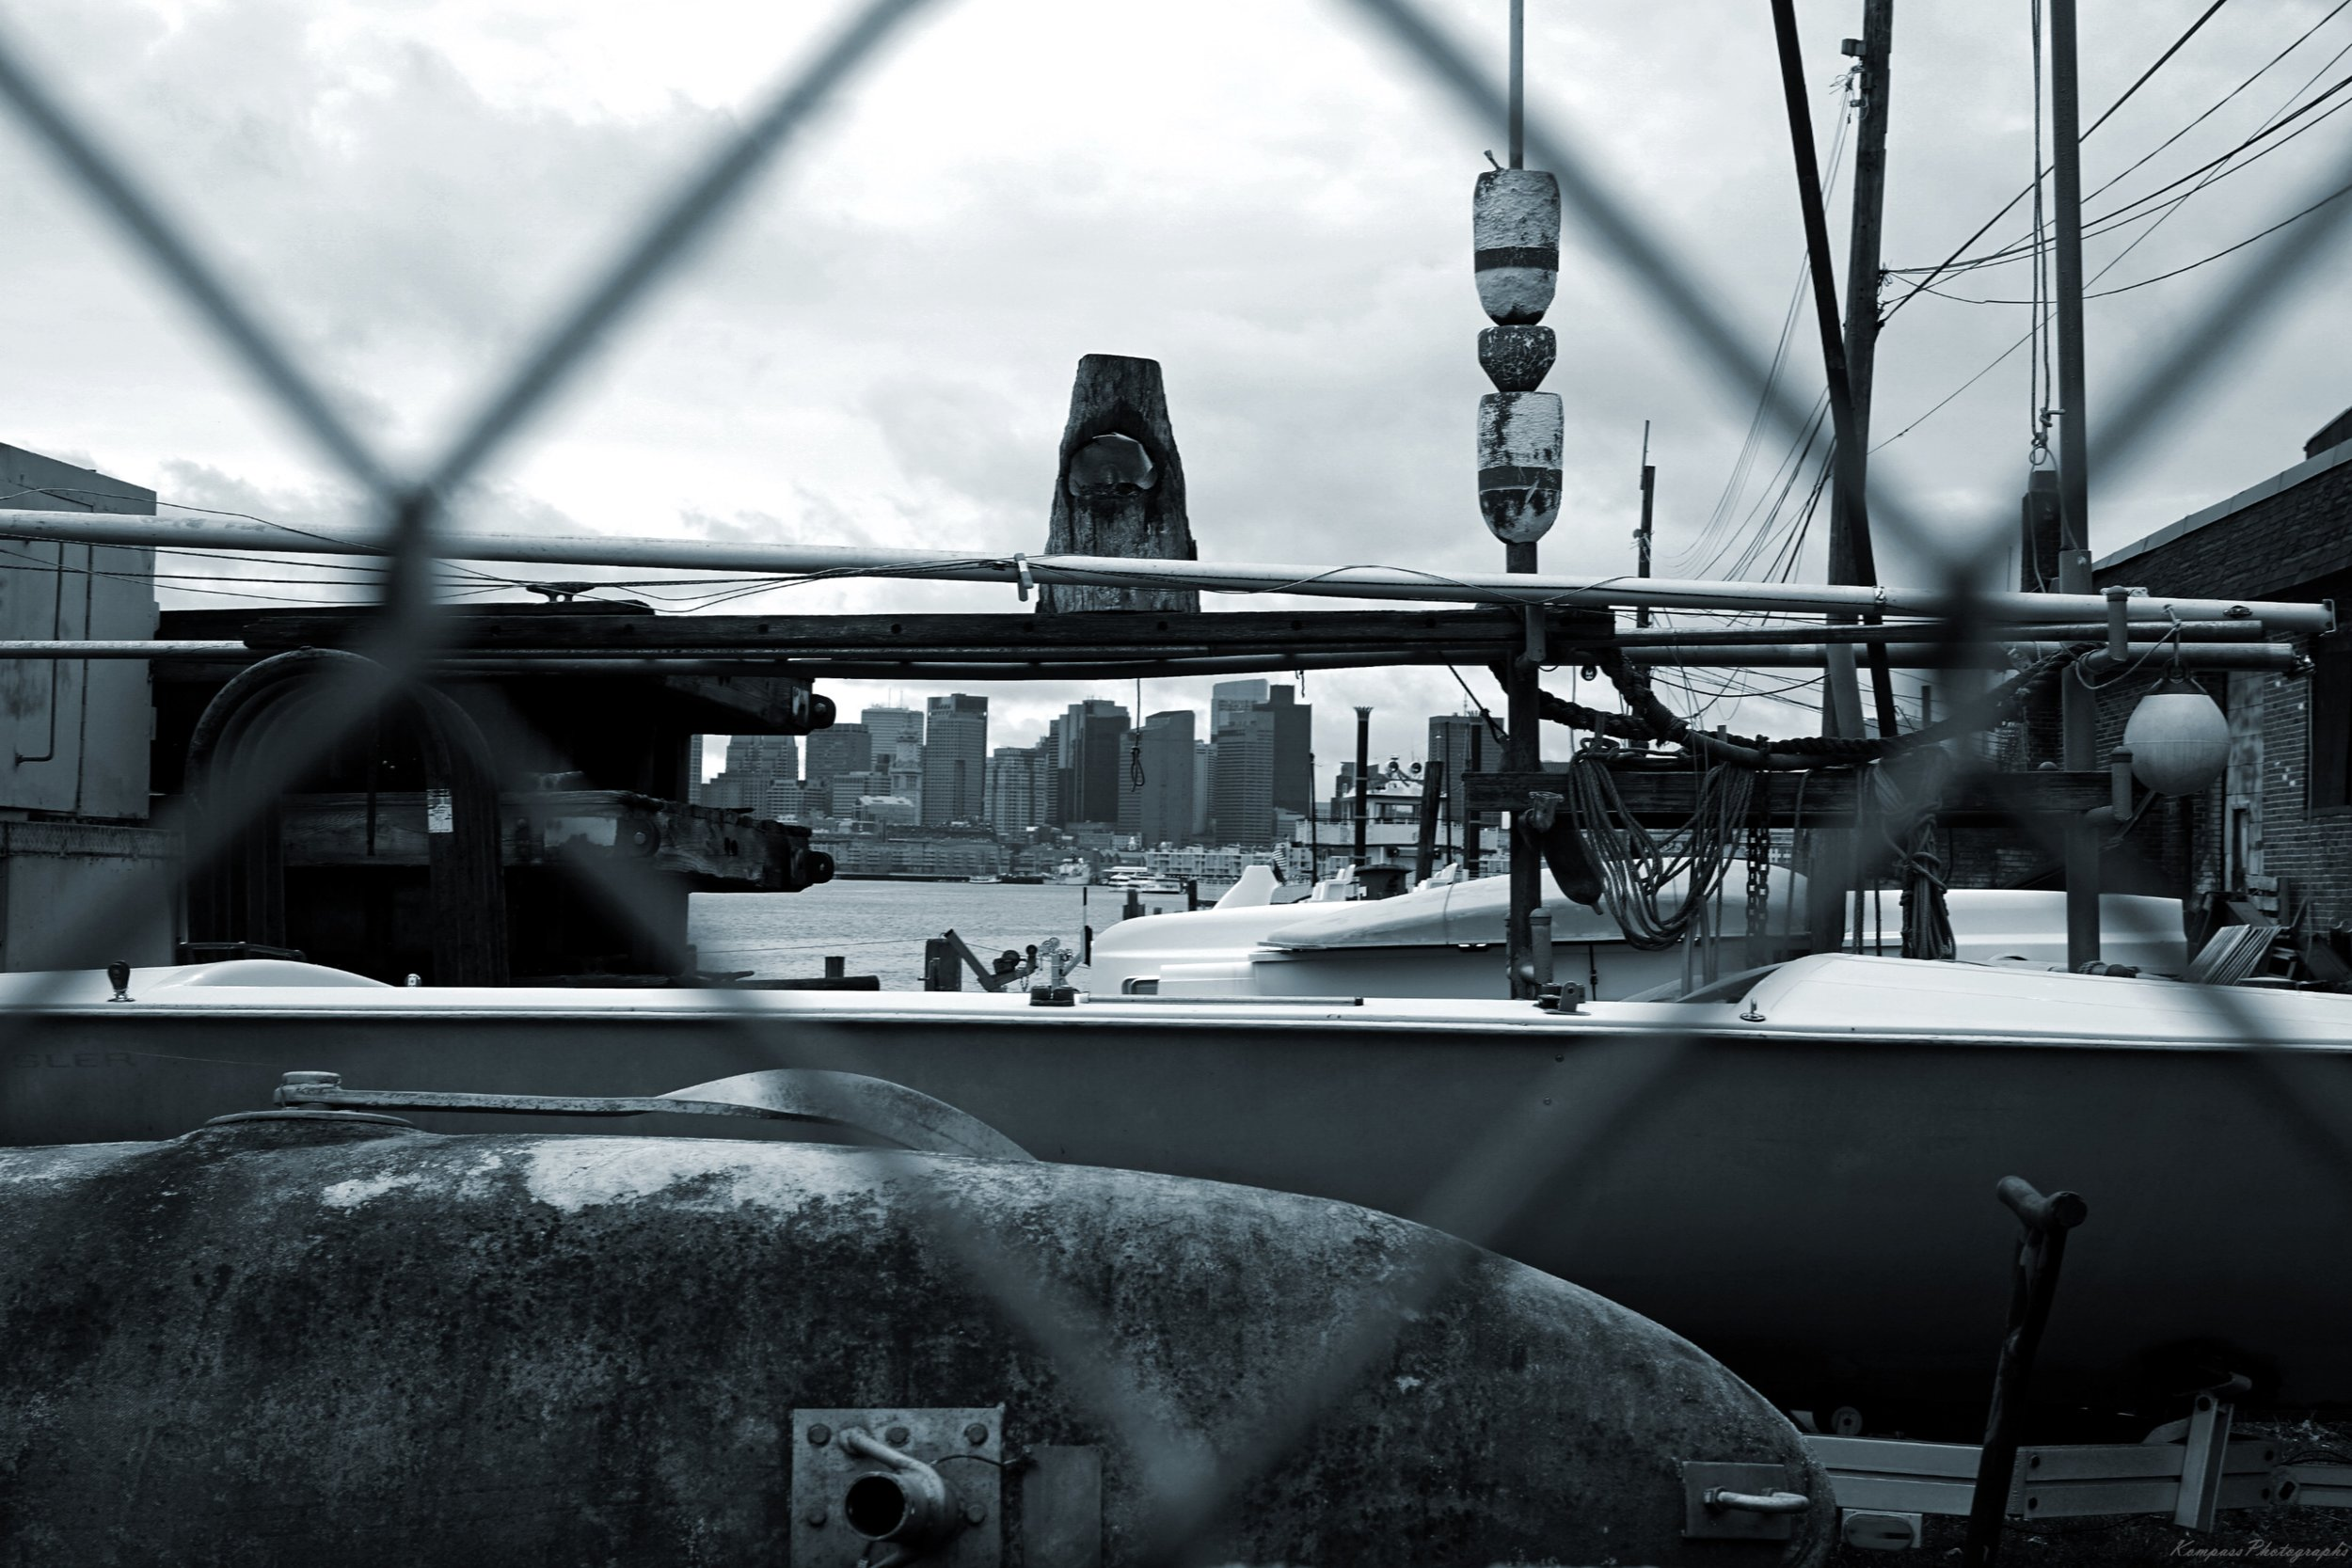 BostonSkyShipyard-bws-2019.jpg